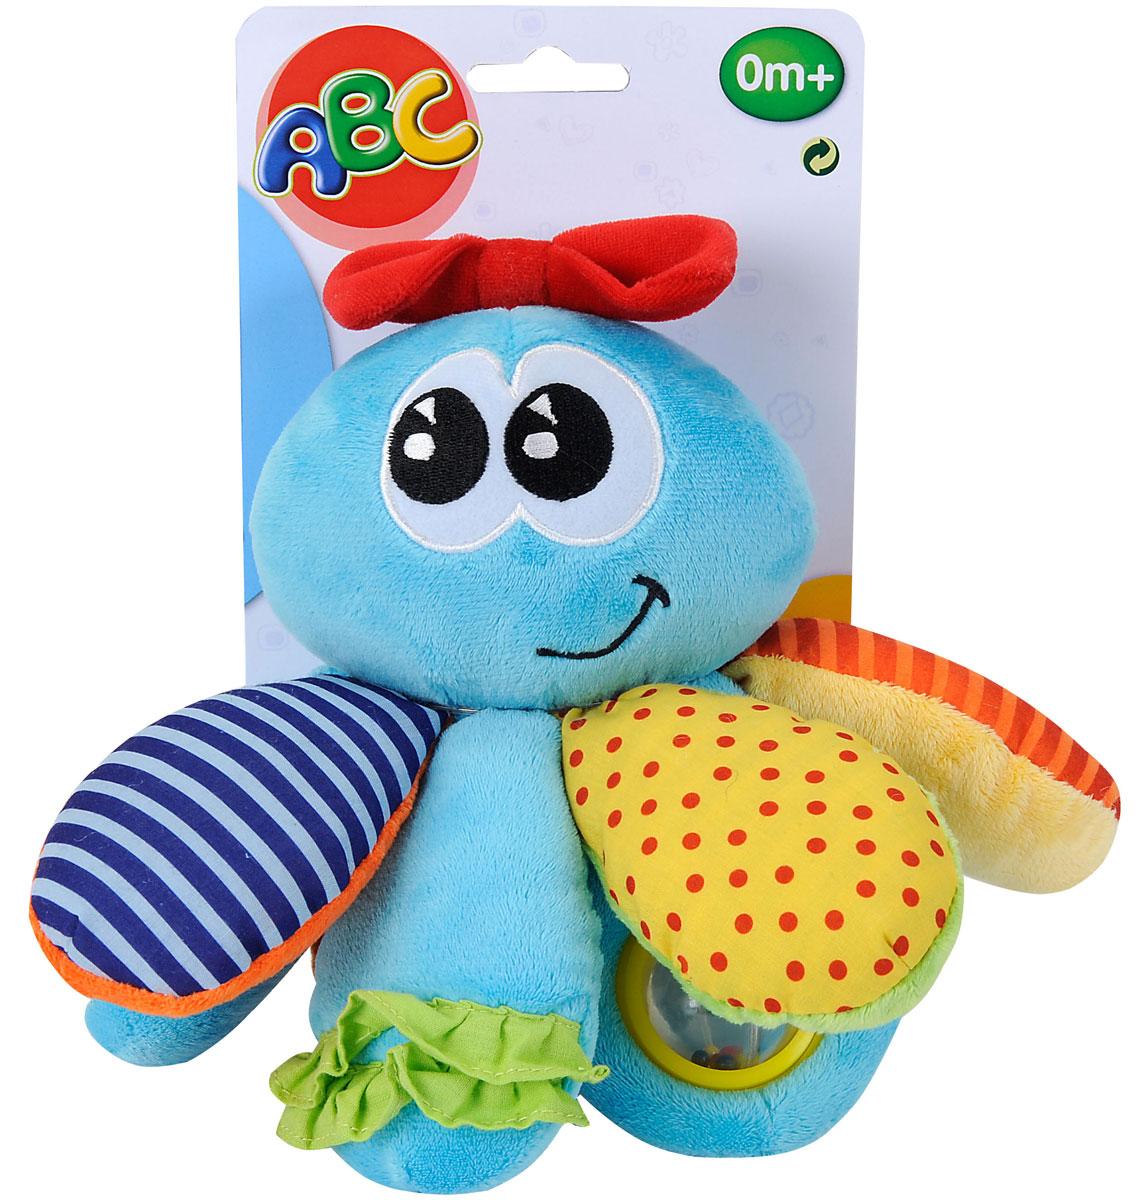 SimbaМягкая игрушка-погремушка Осьминожка Simba